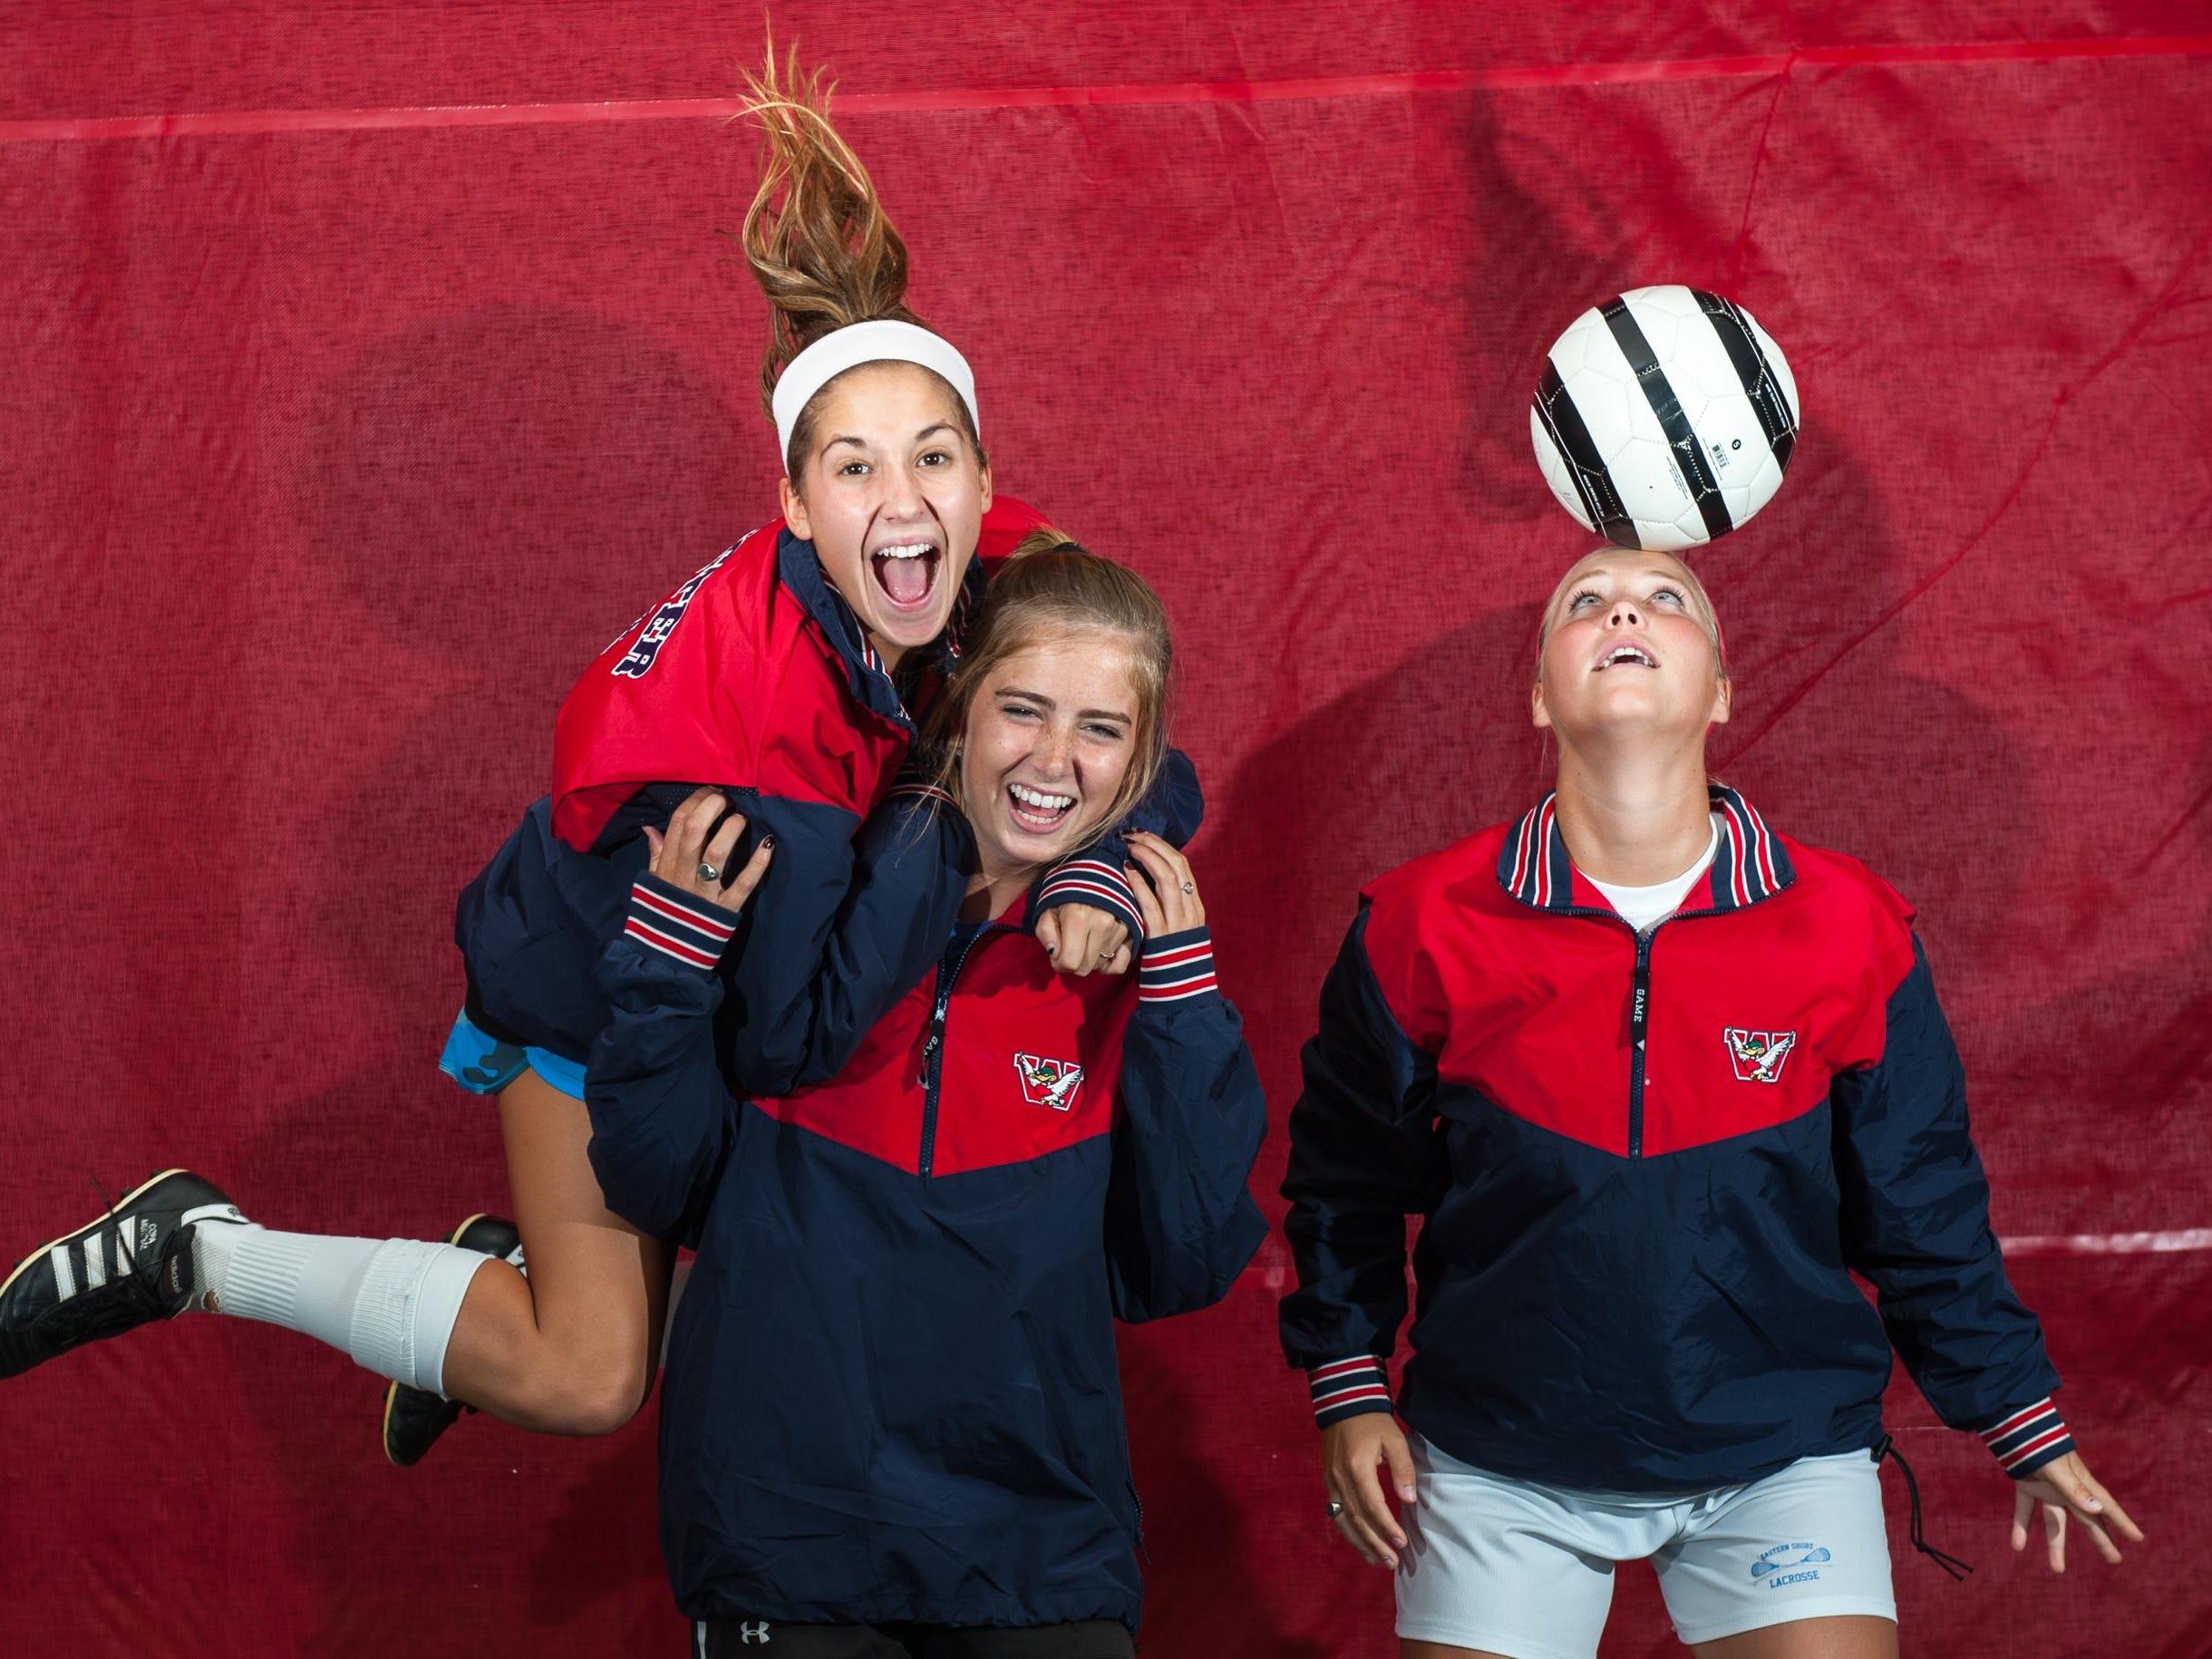 Worcester Prep girls soccer captains Julia D'Antonio, Regan Shanahan and Grace Tunis have the Mallards 4-0 to start the season.